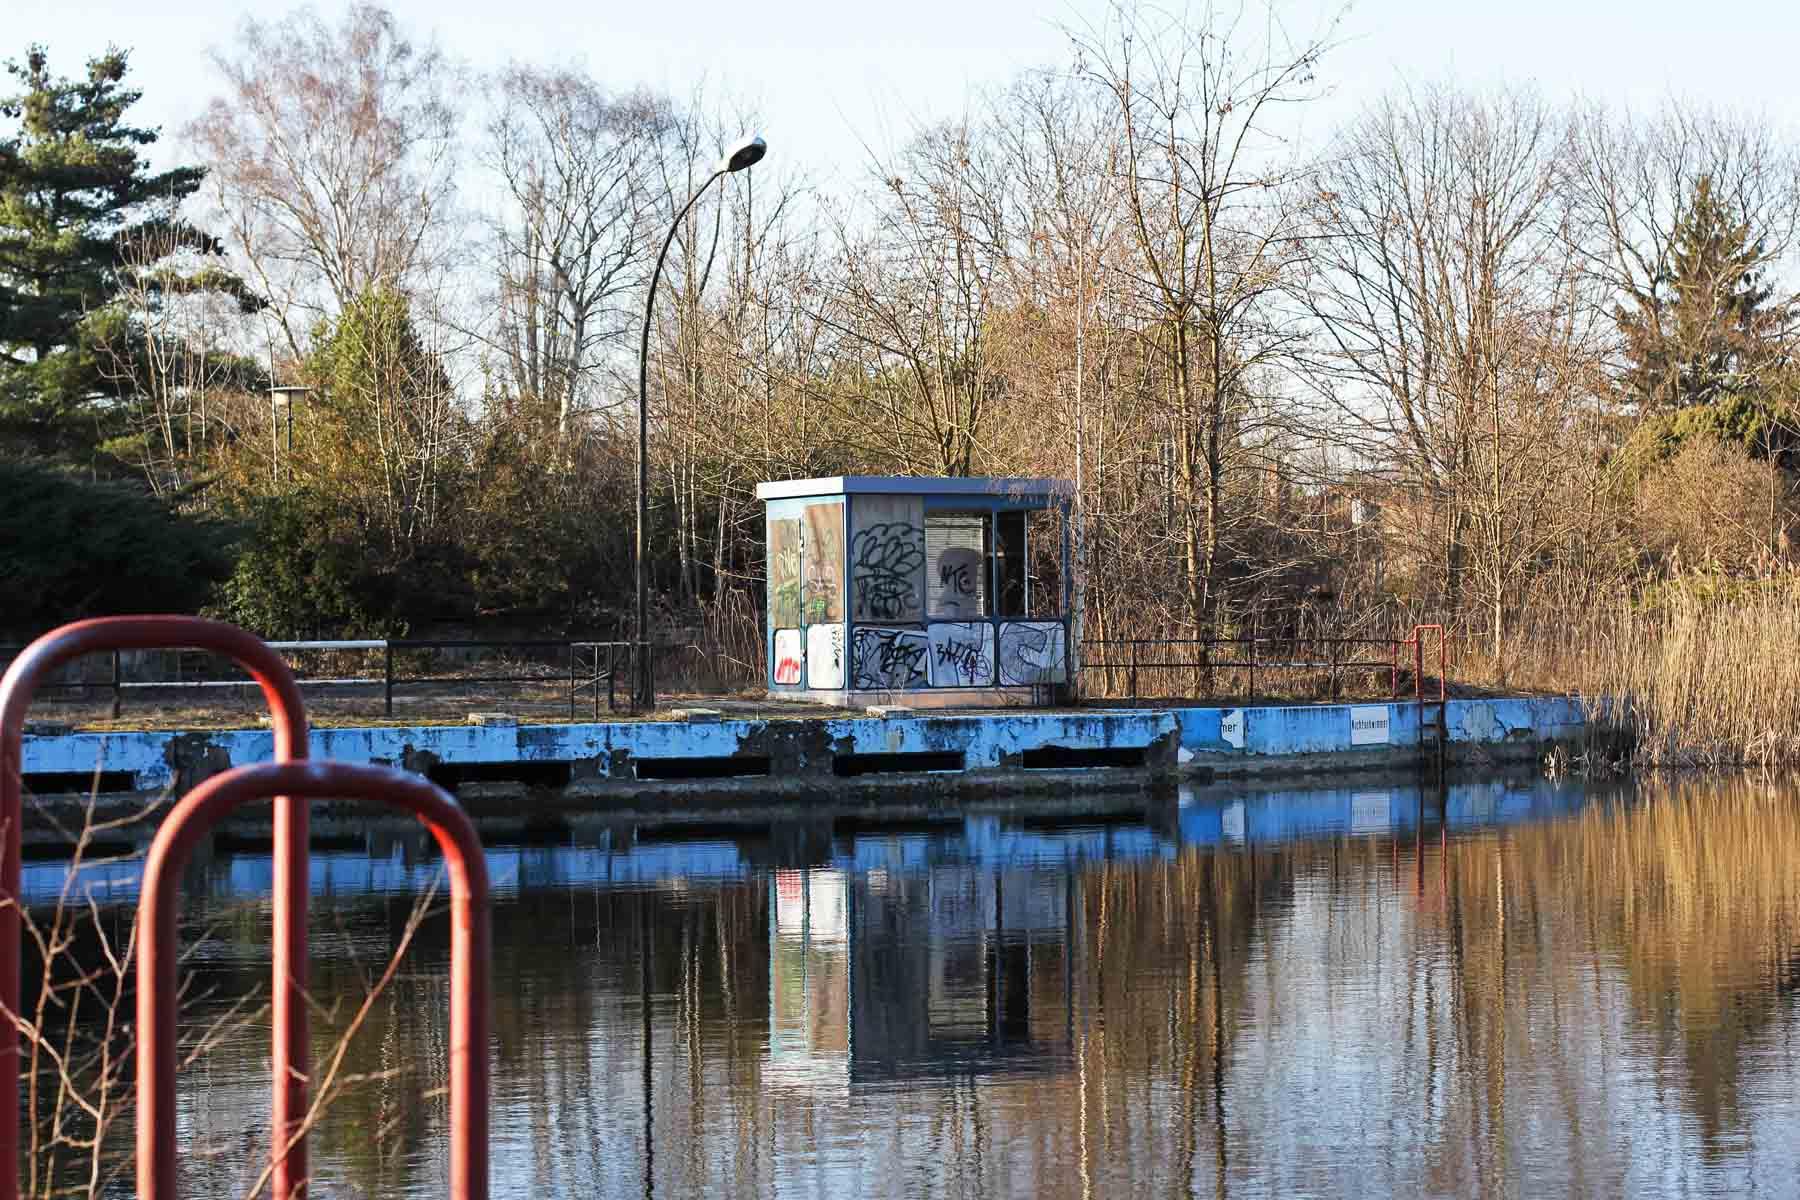 wernerbad berlin hippo habitat under threat. Black Bedroom Furniture Sets. Home Design Ideas